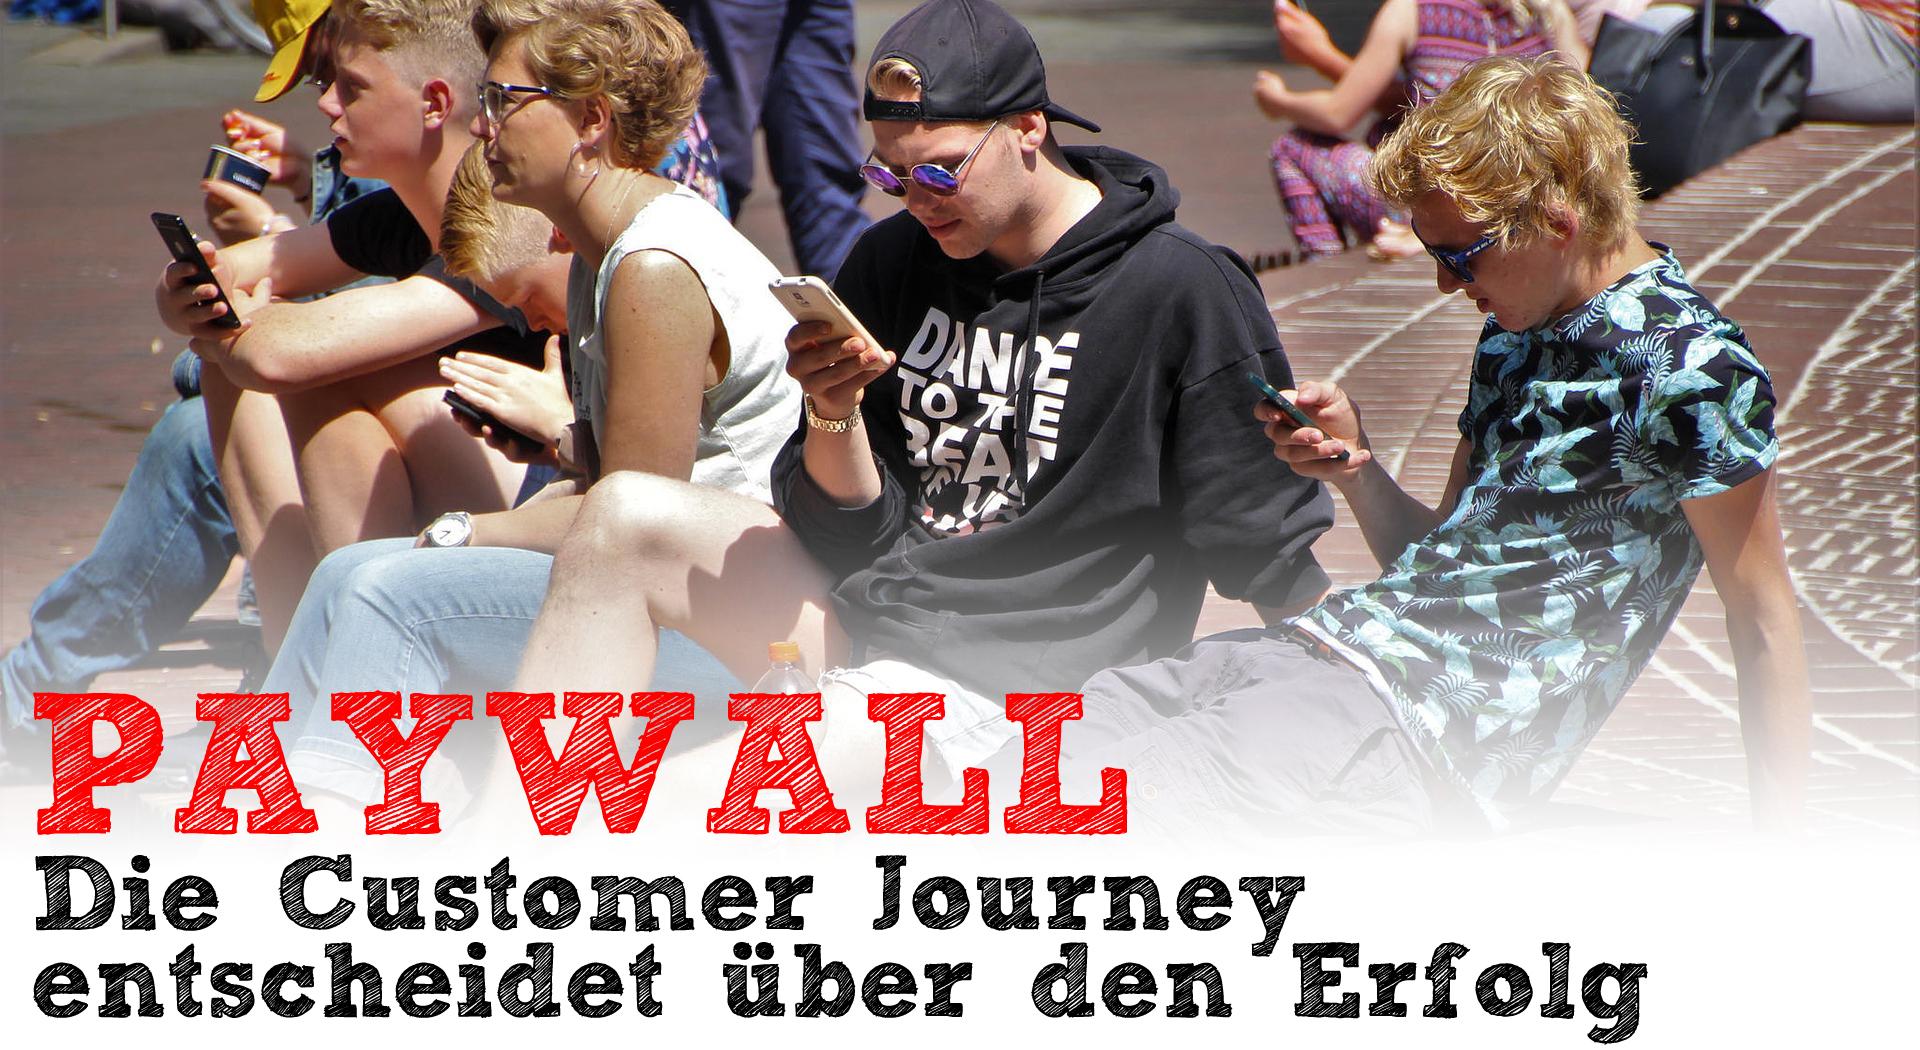 Paywall Customer Journey